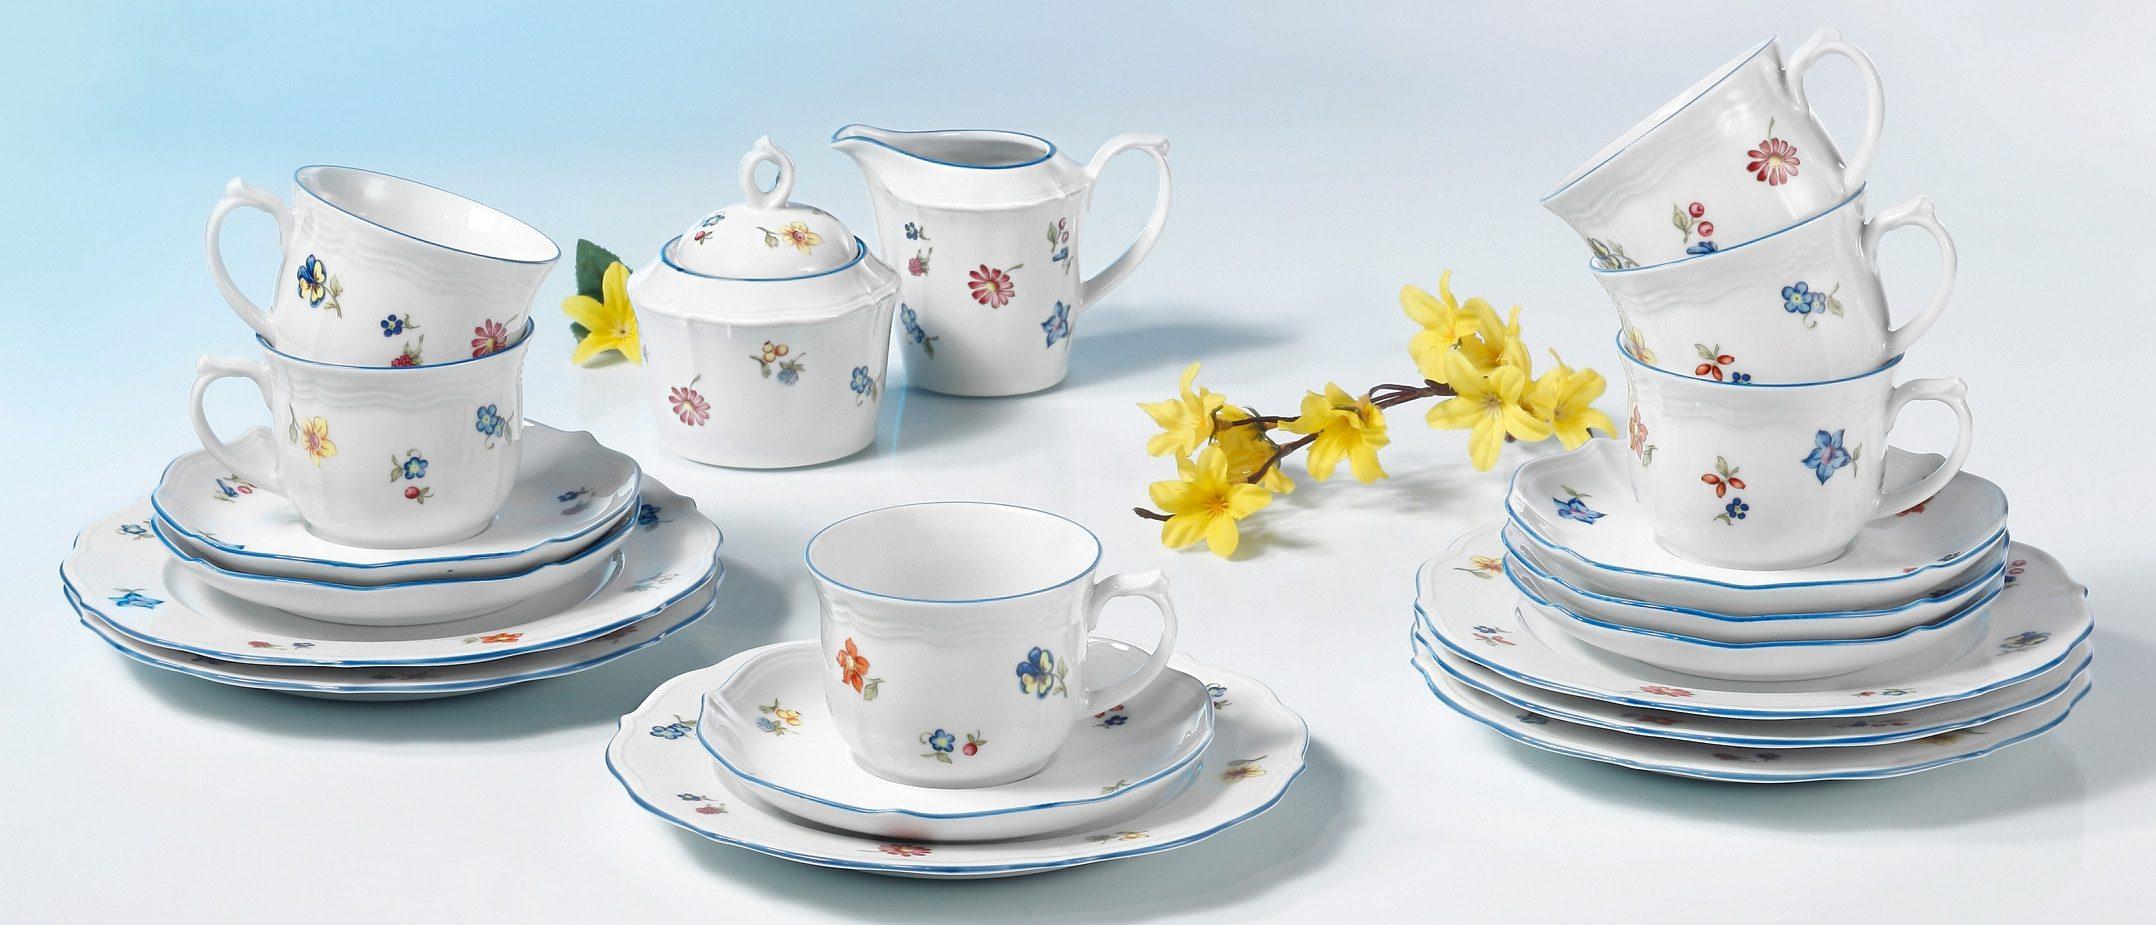 SELTMANN Weiden Kaffeeservice »Sonate Streublume«, 20-teilig